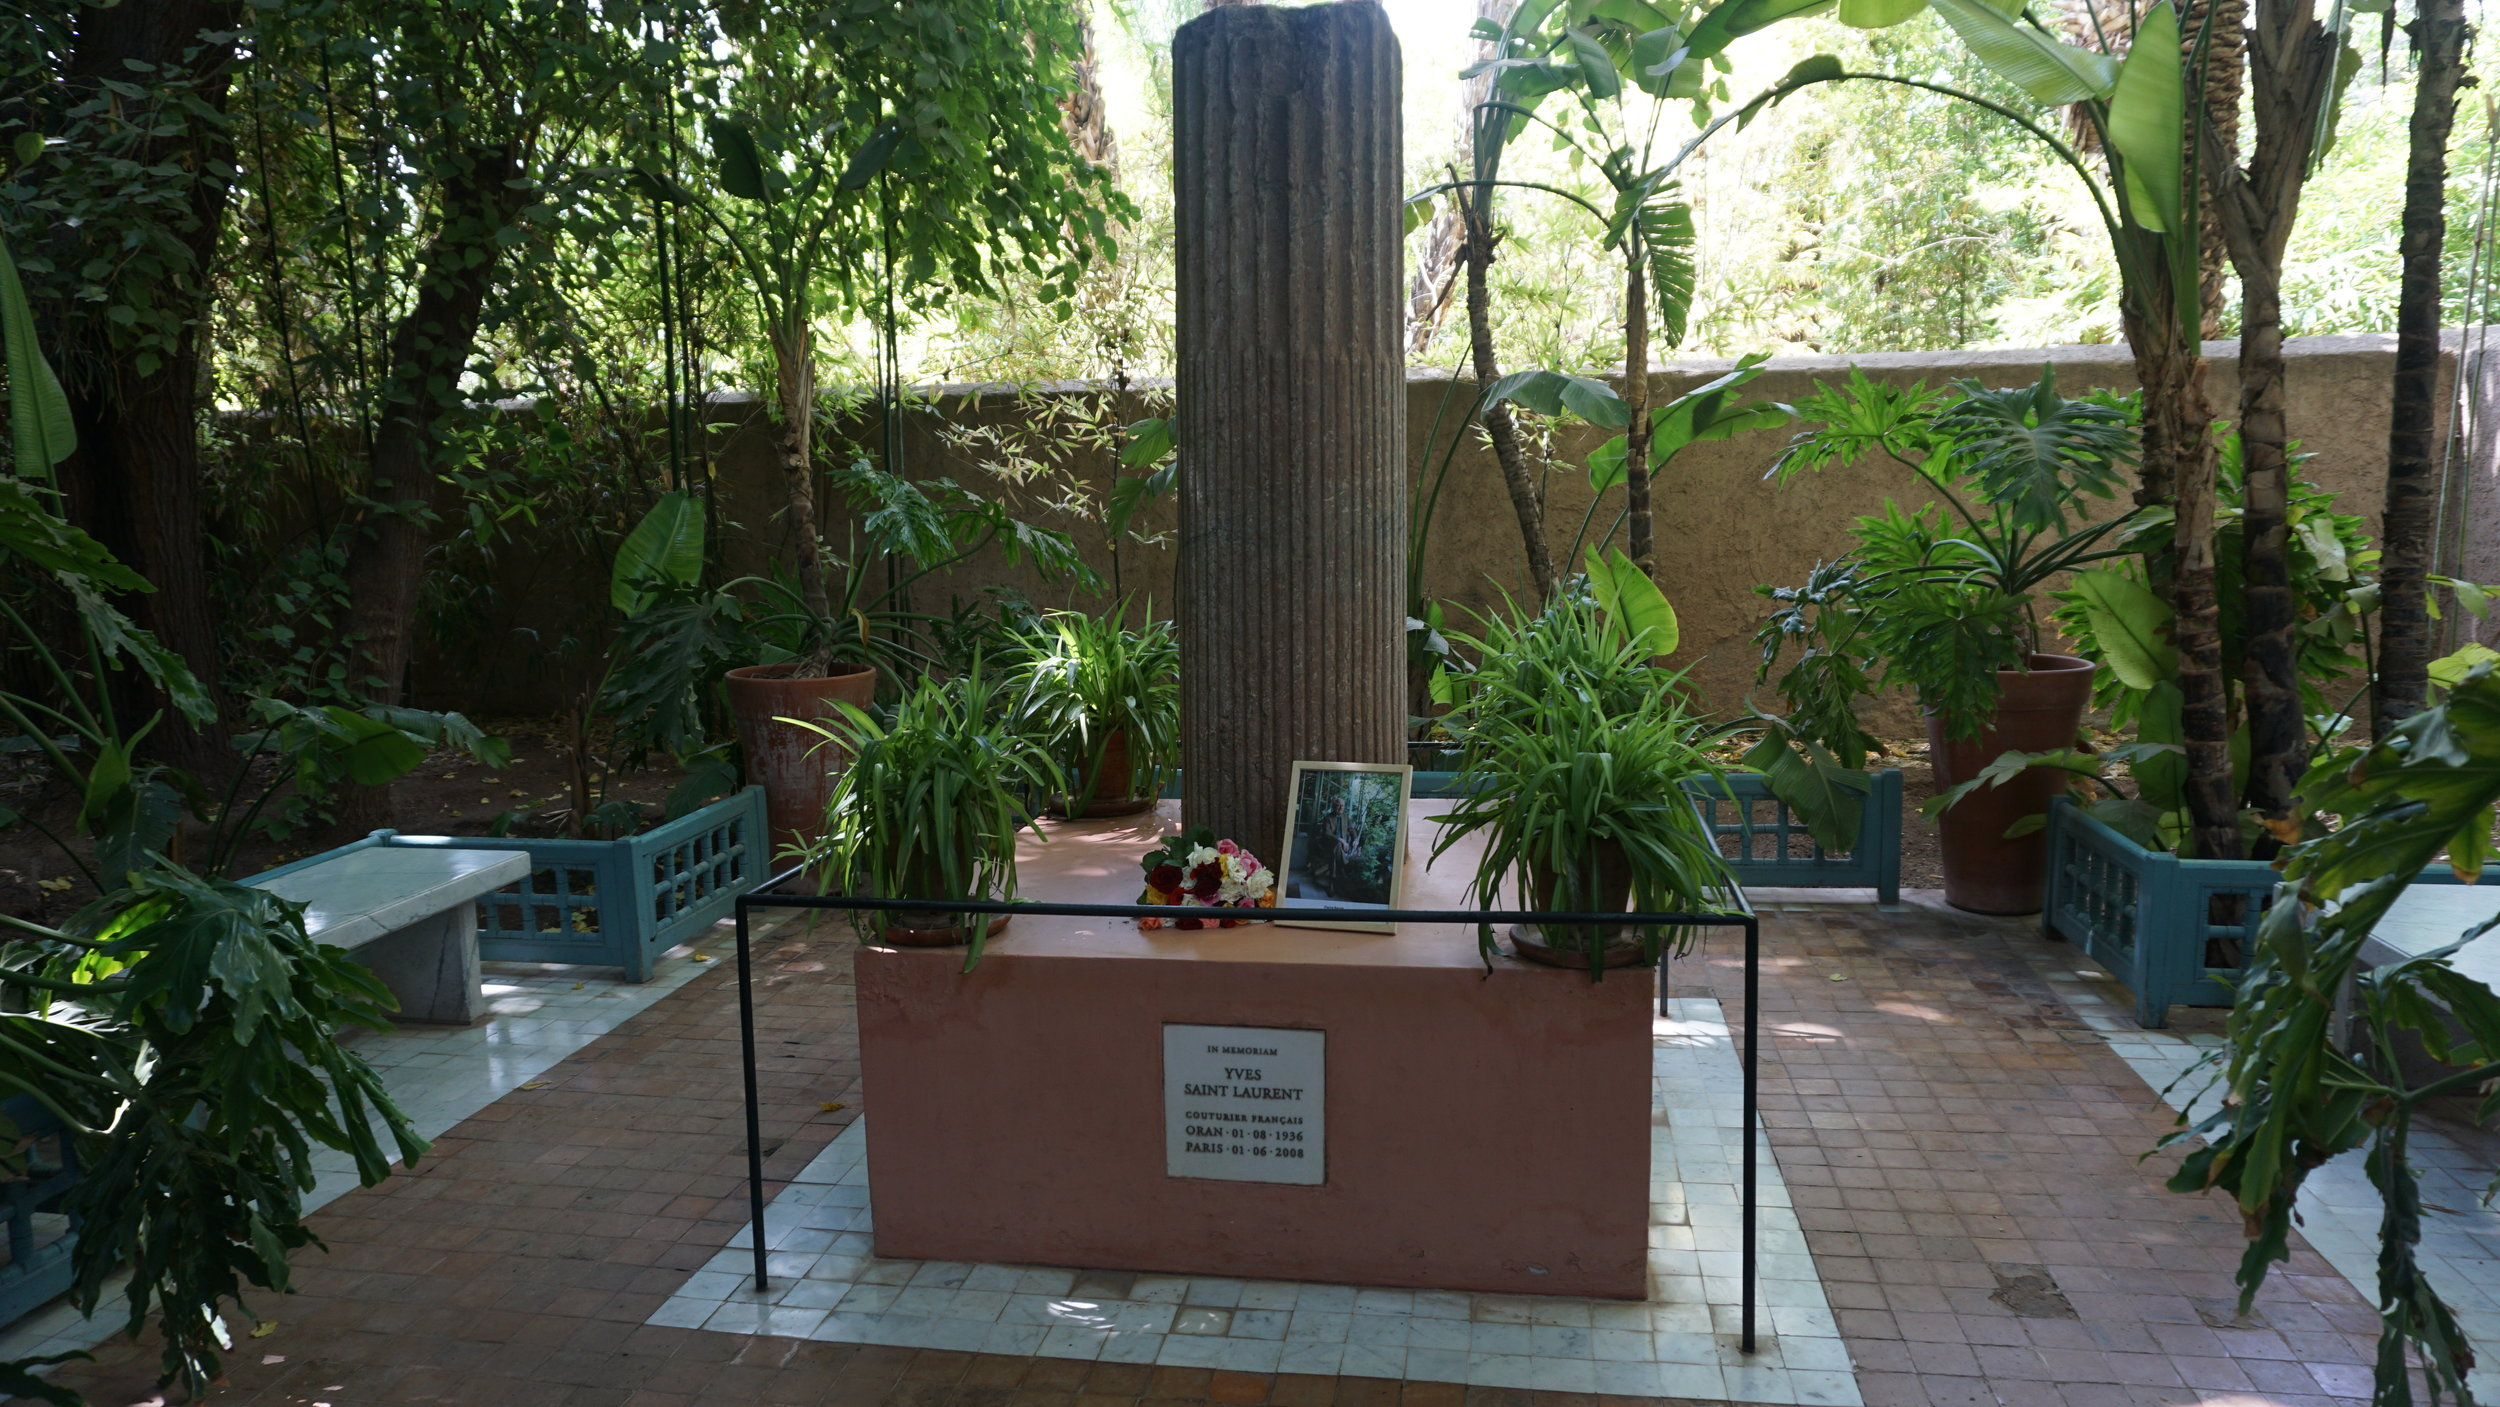 YSL Memorial in Jardin Majorelle, Marrakech